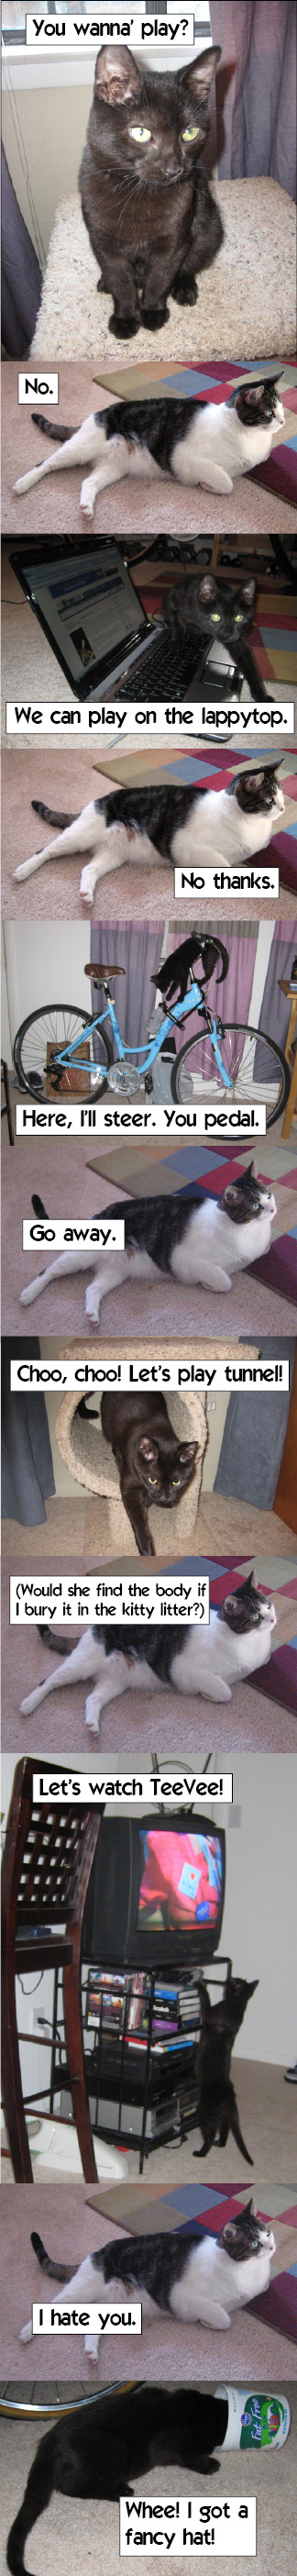 Cats - a saga